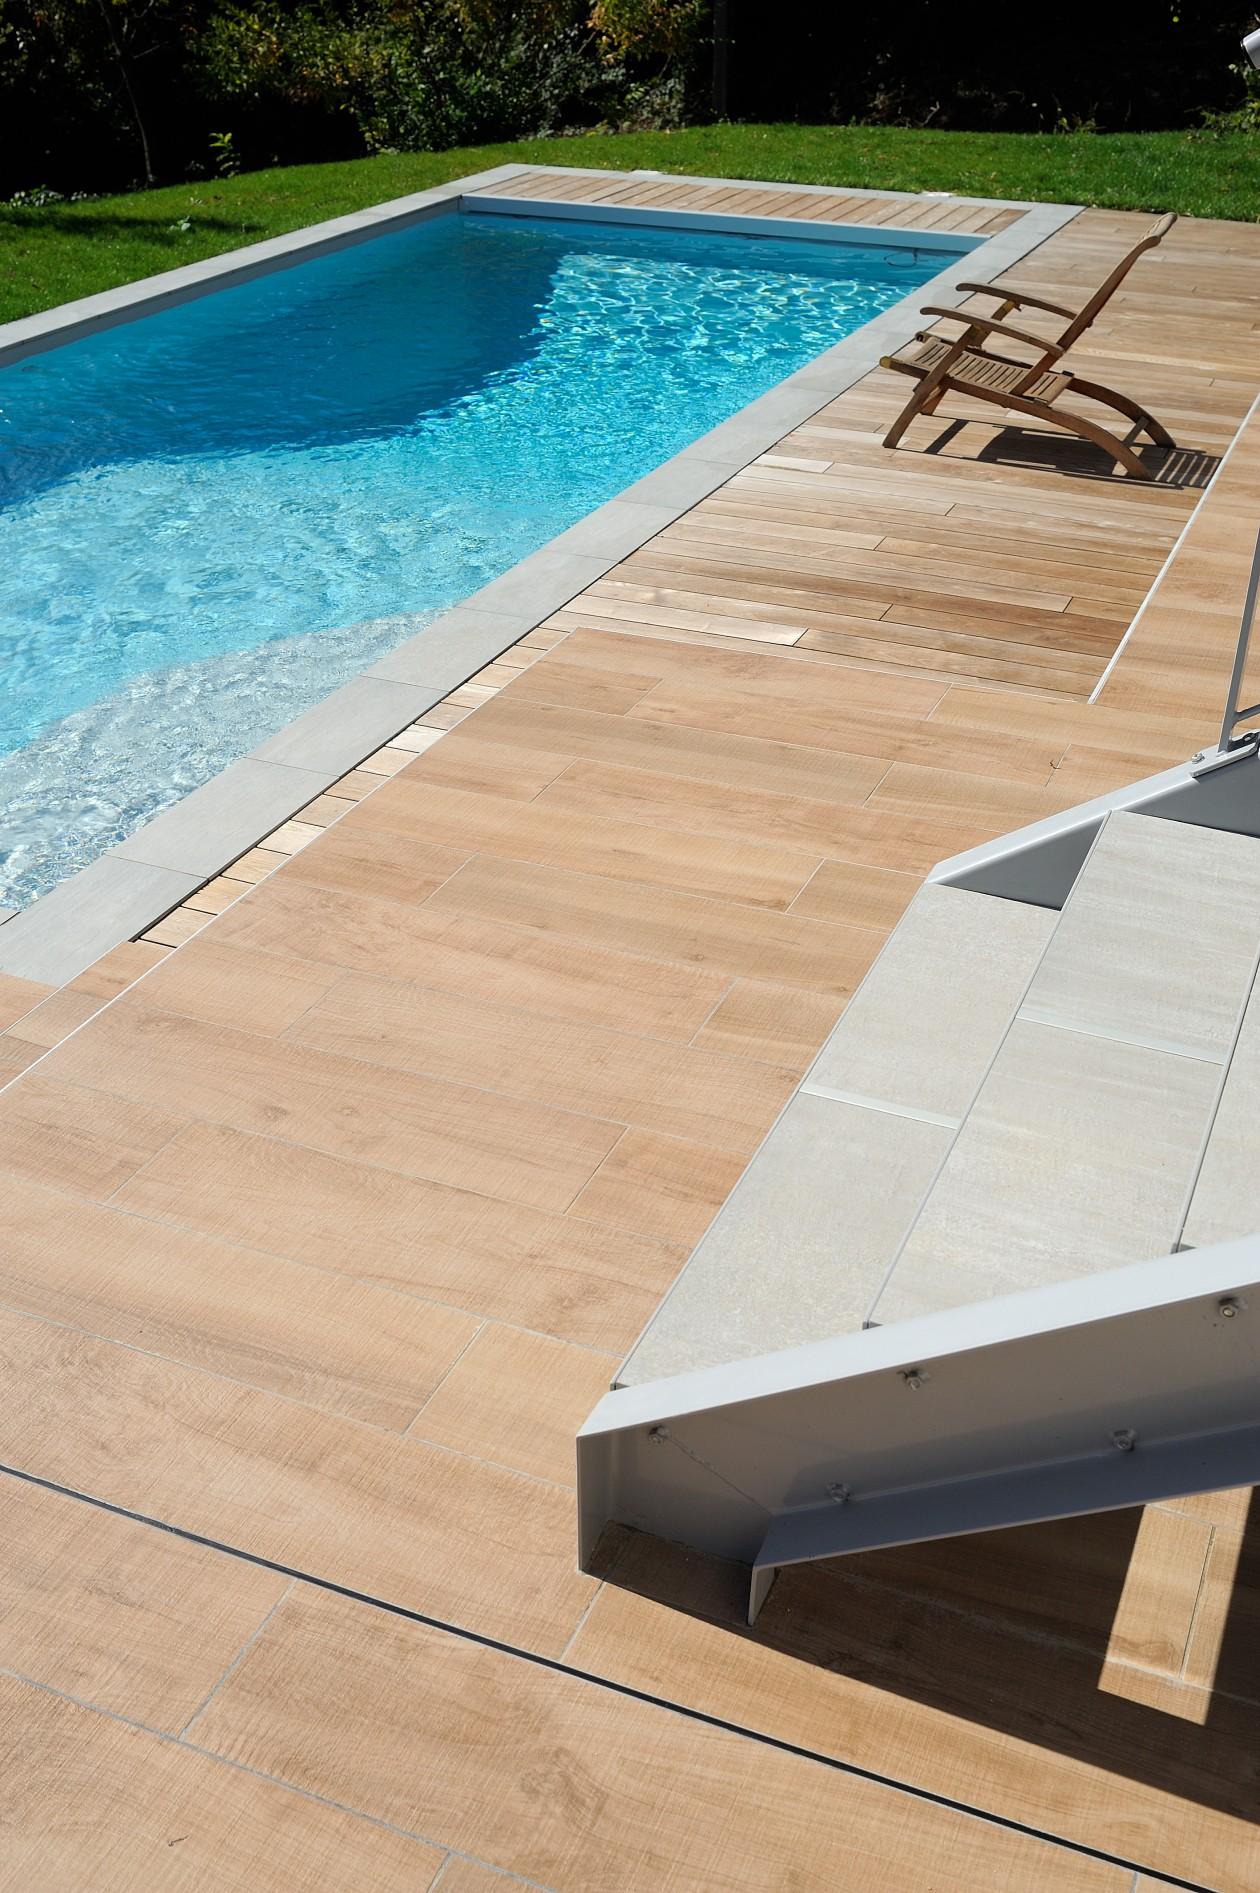 Piscine escalier d 39 angle neyron piscines concept for Piscine concept